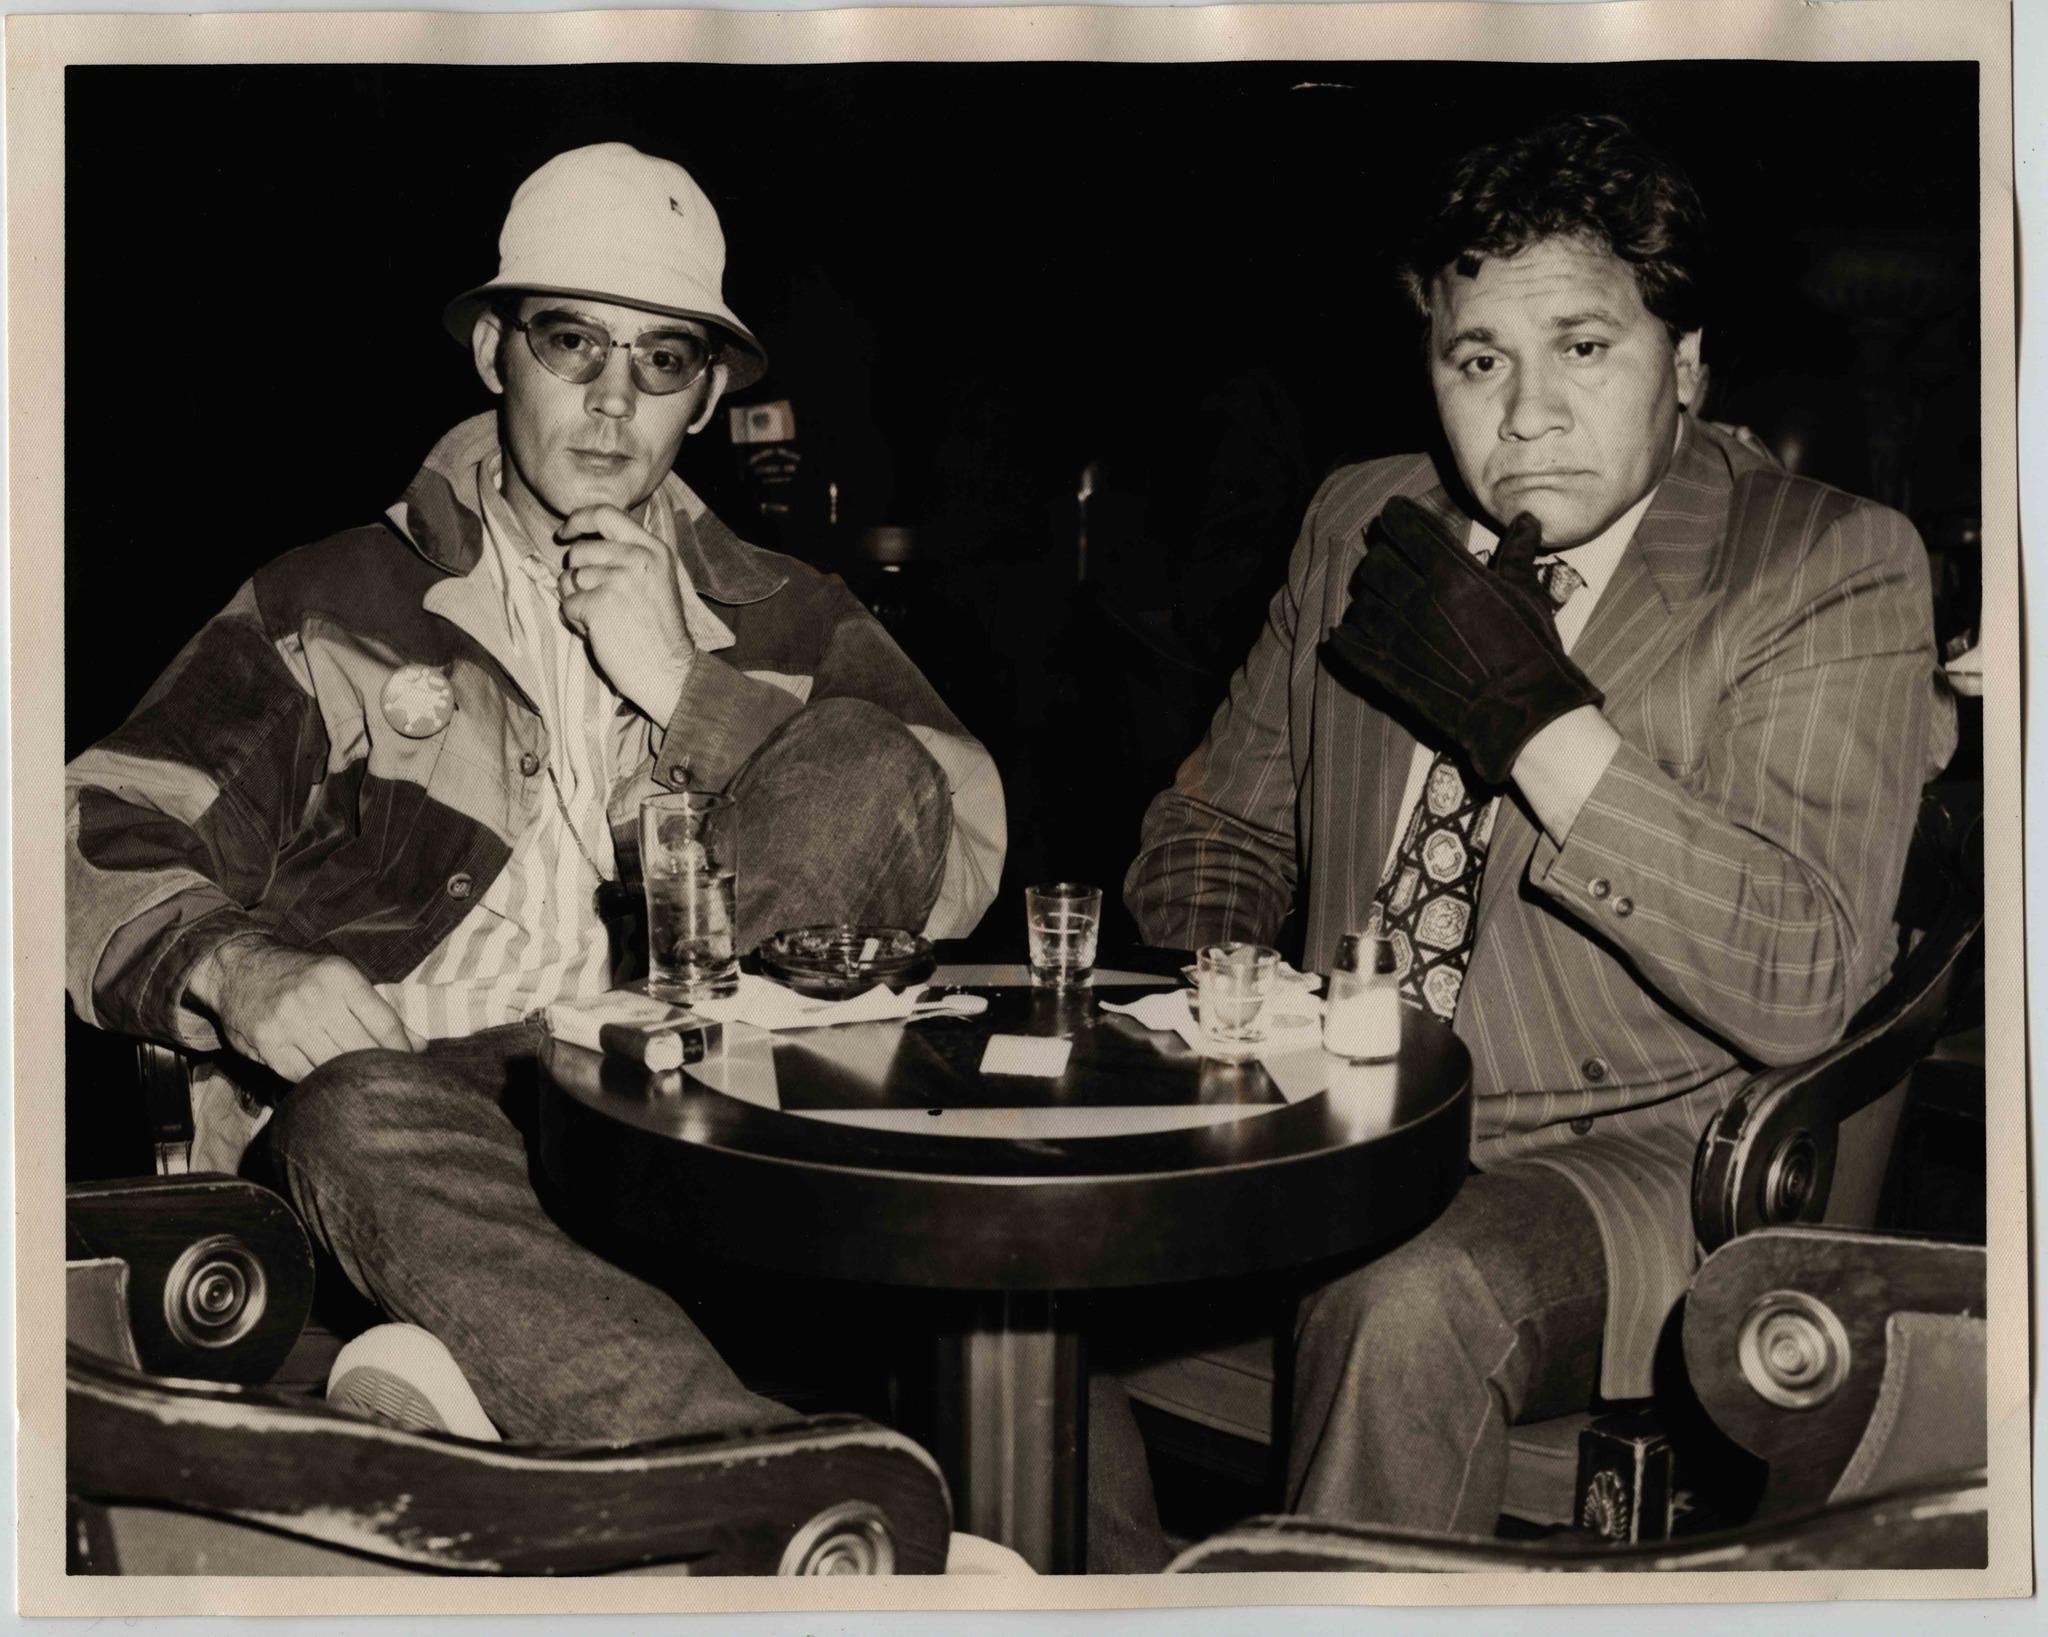 Oscar Zeta Acosta with Hunter S. Thompson